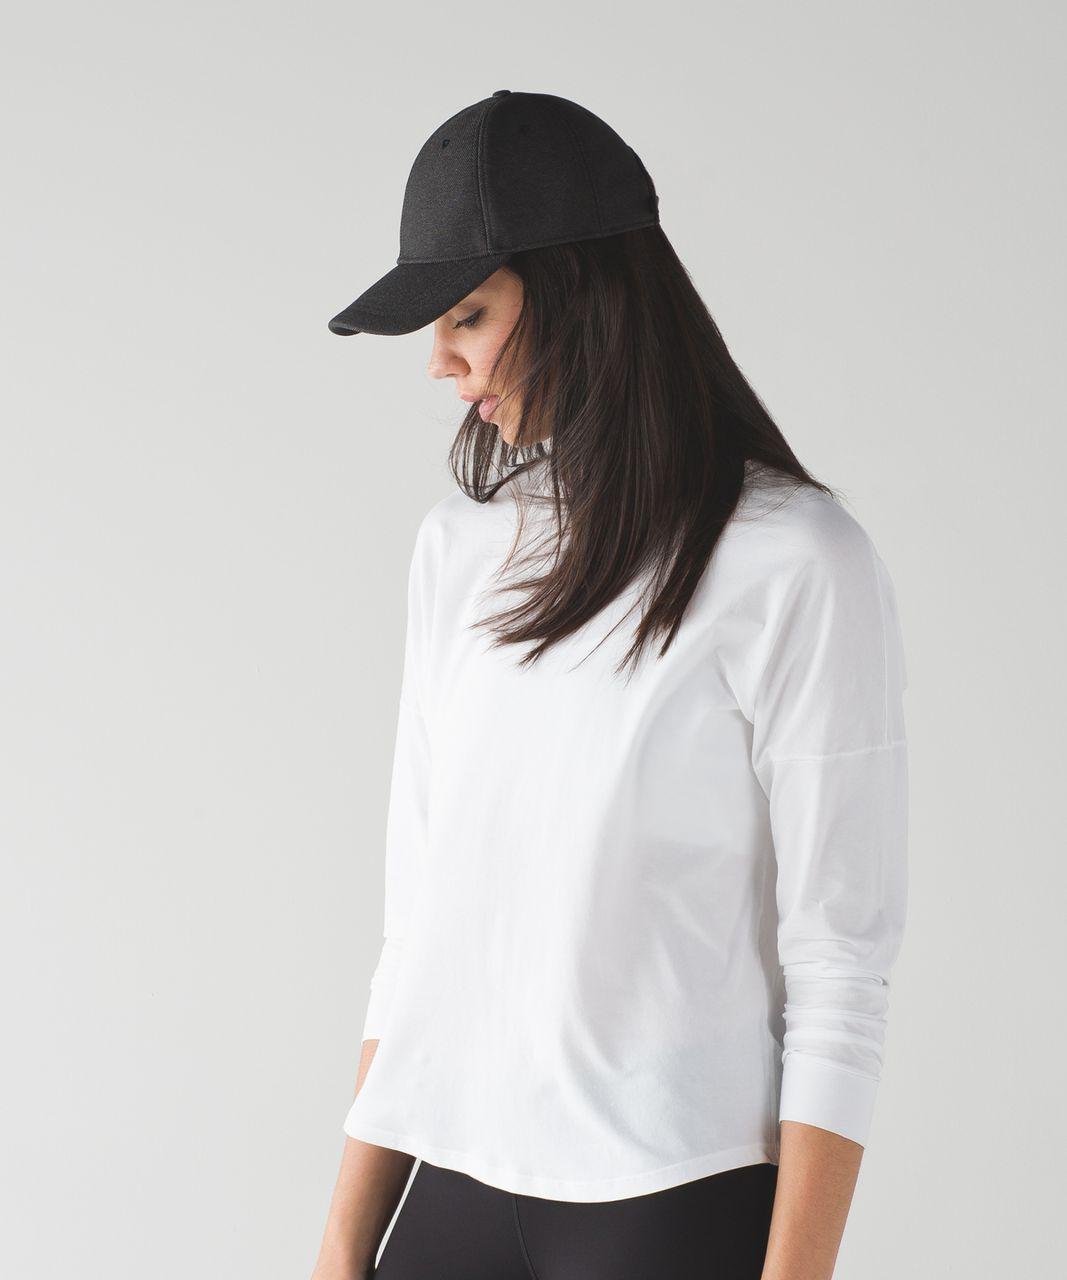 Lululemon Baller Hat Softshell - Black / Dark Carbon / Black